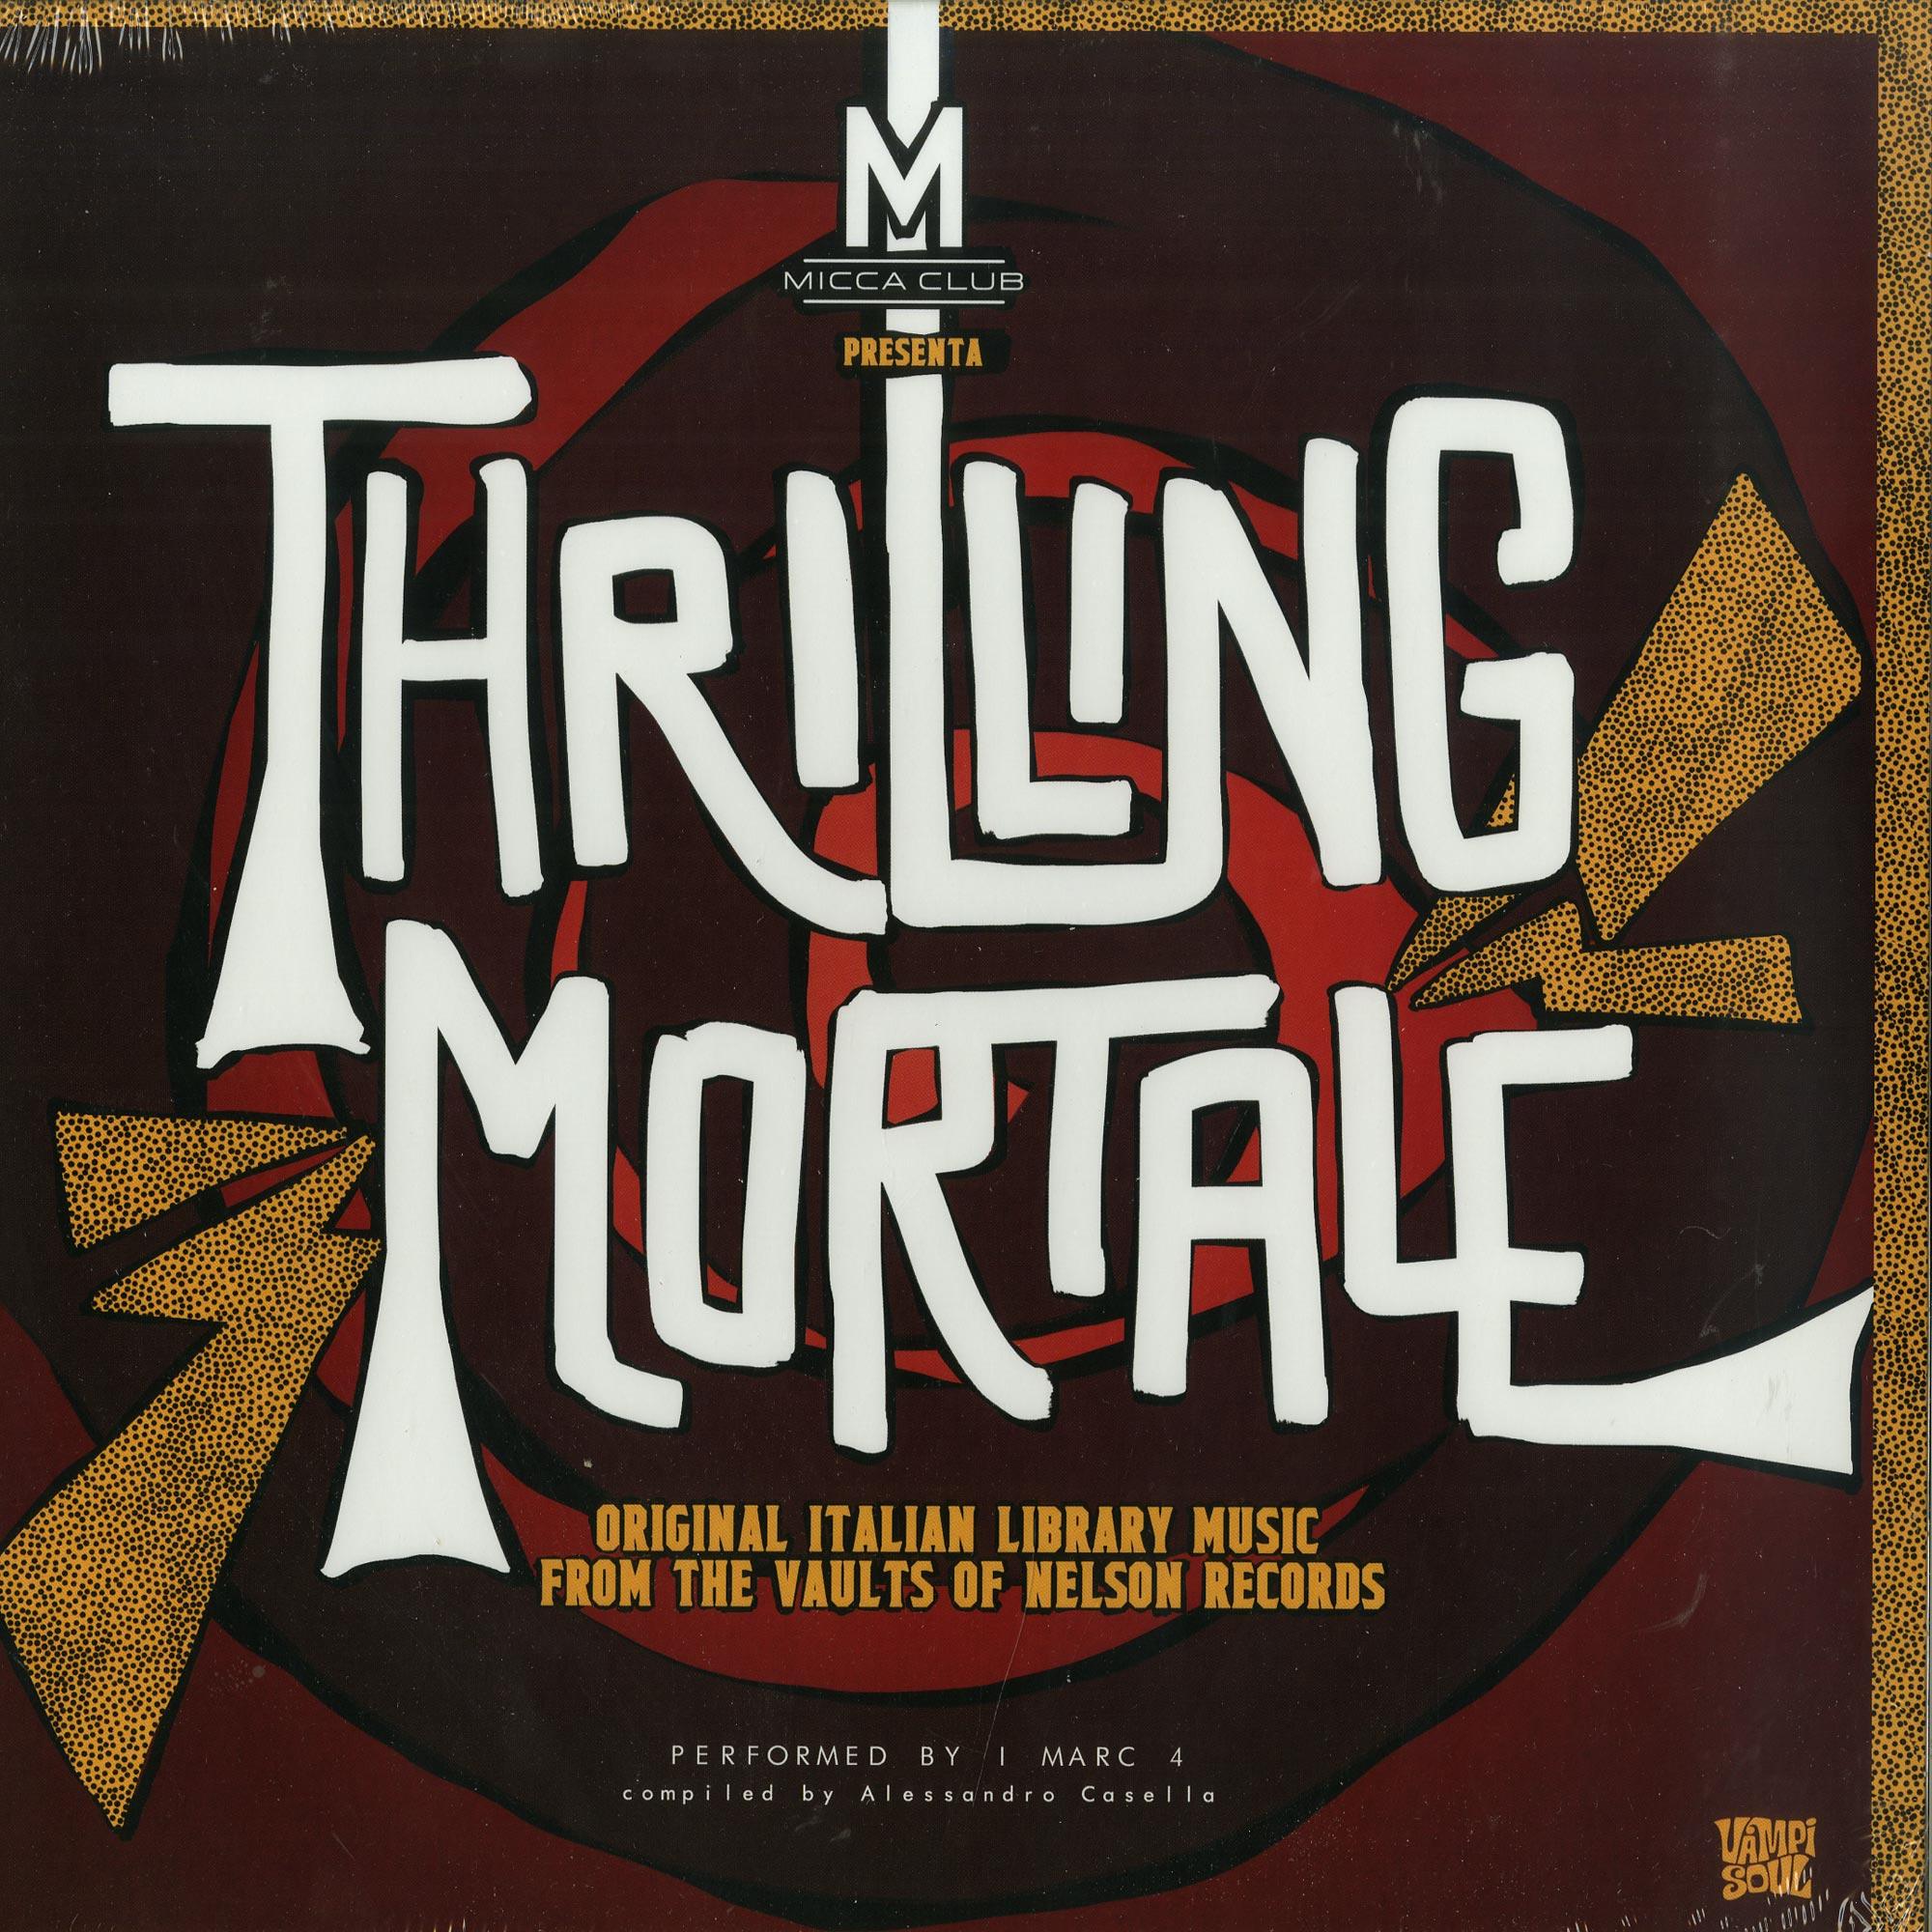 I Marc 4 - THRILLING MORTALE